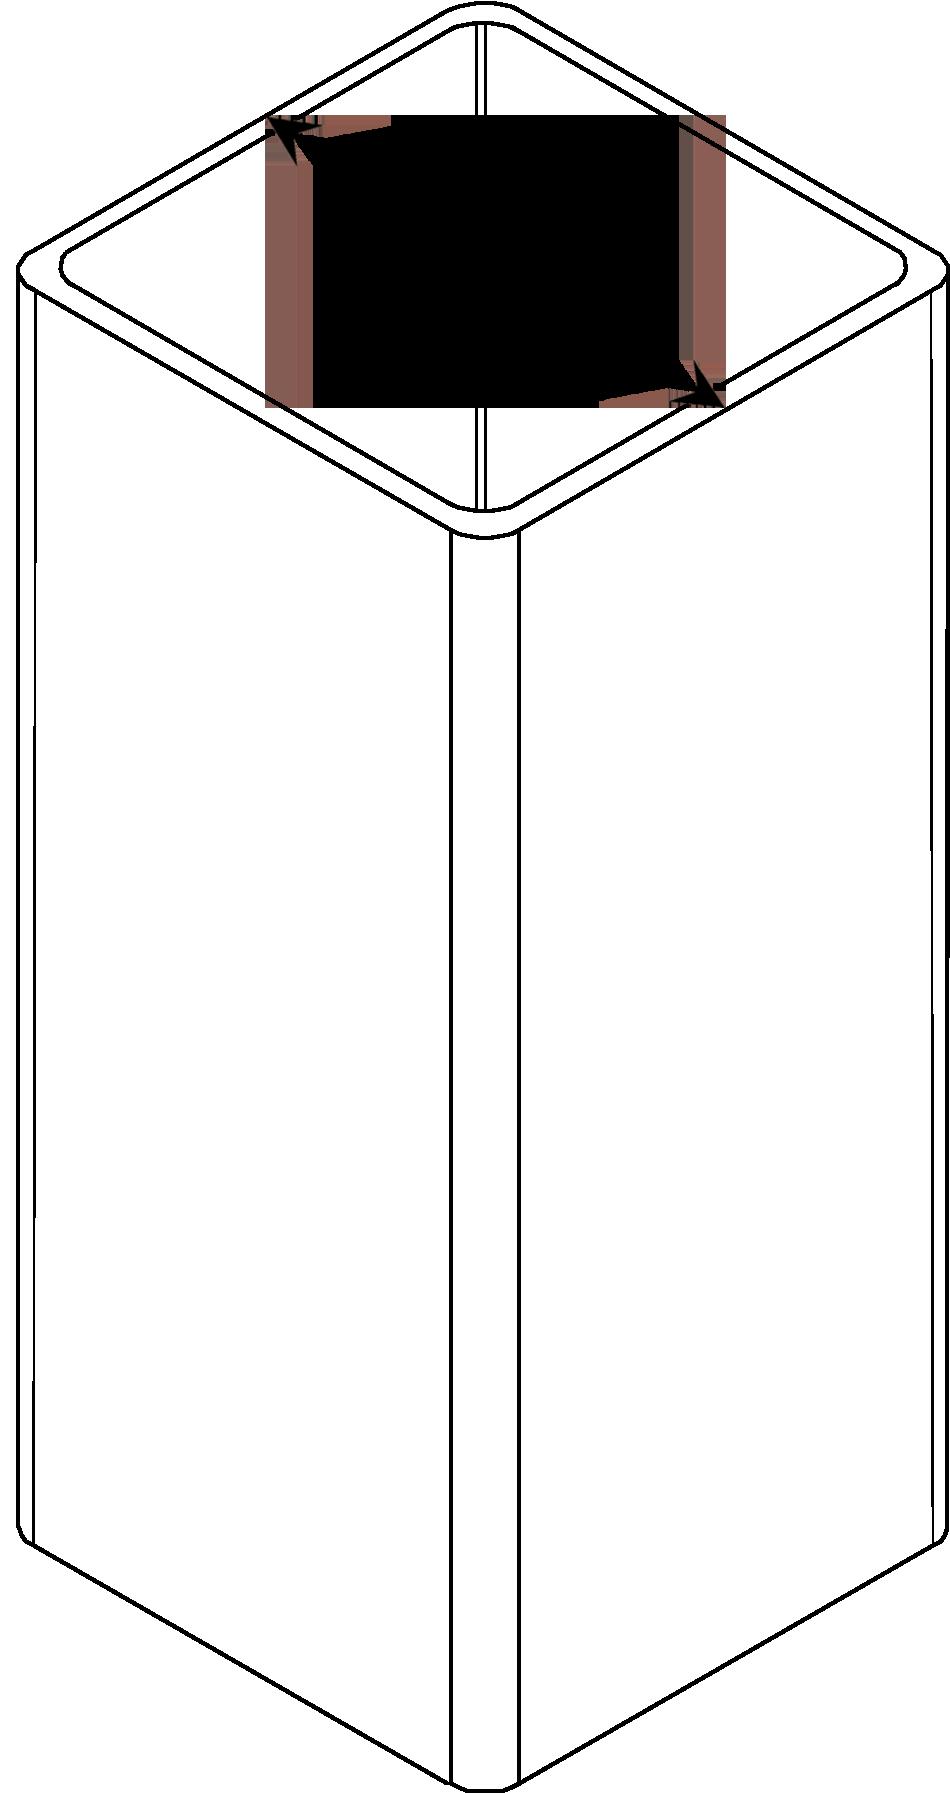 Vinyl Post External Measurement Diagram